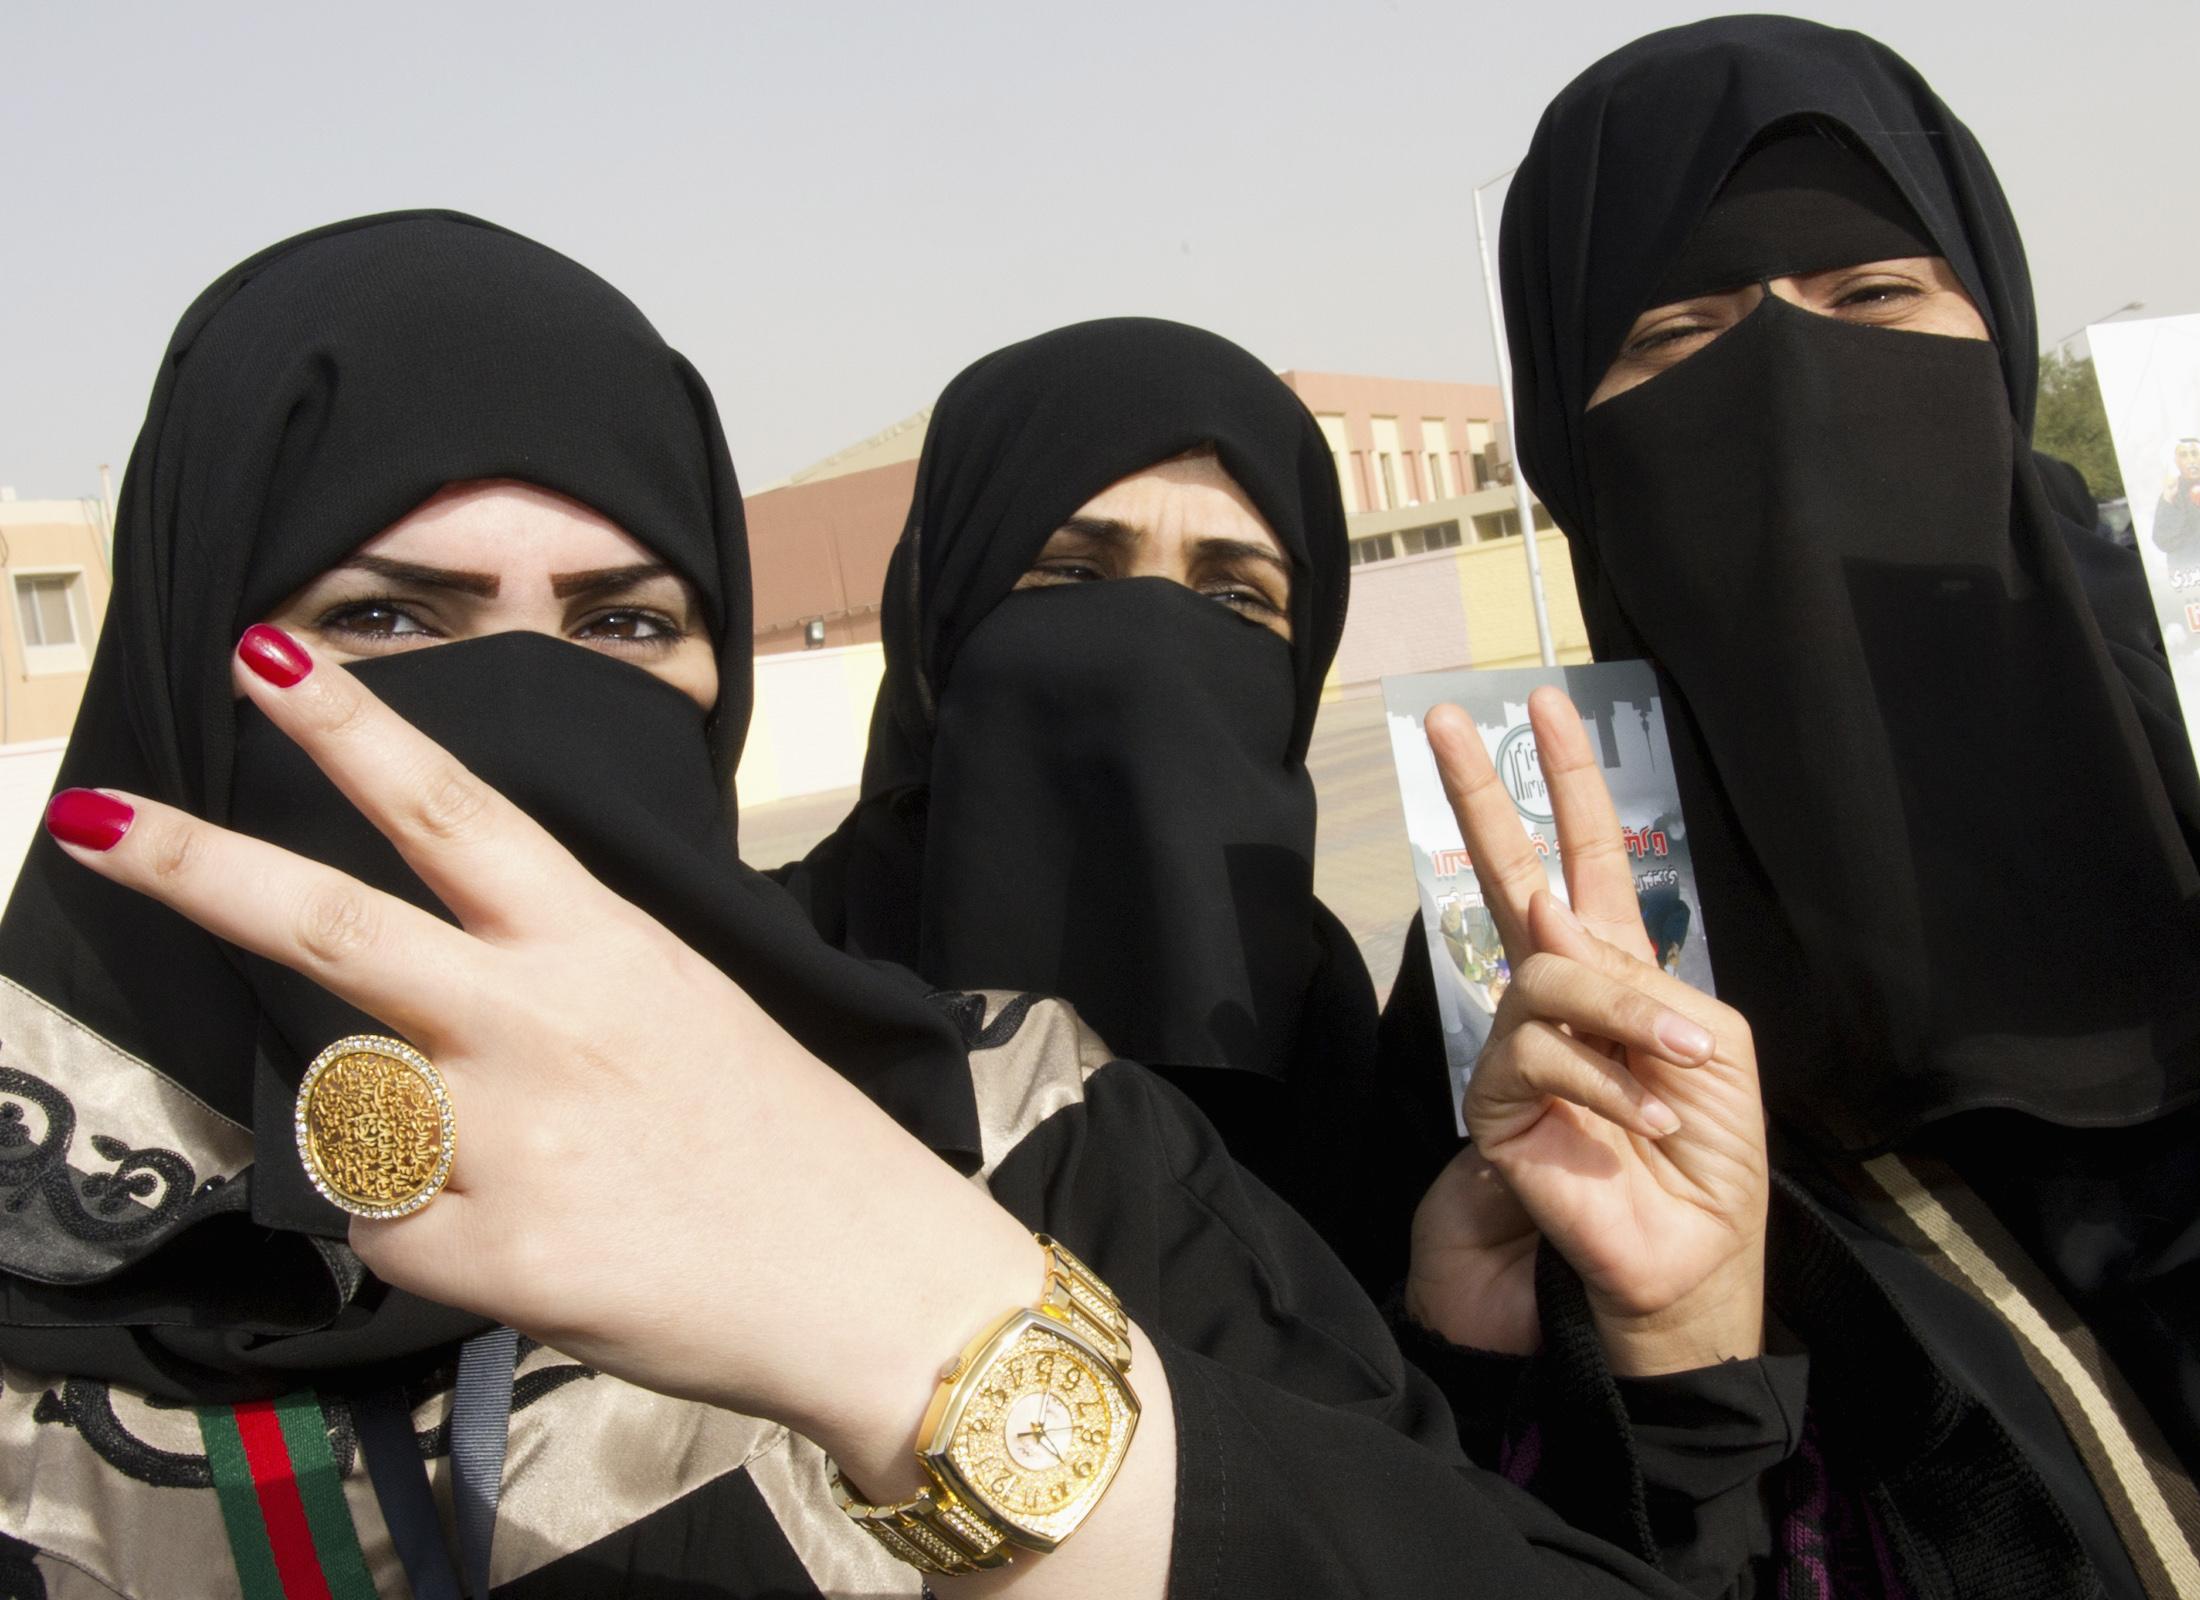 Lesbianism in saudi arabia